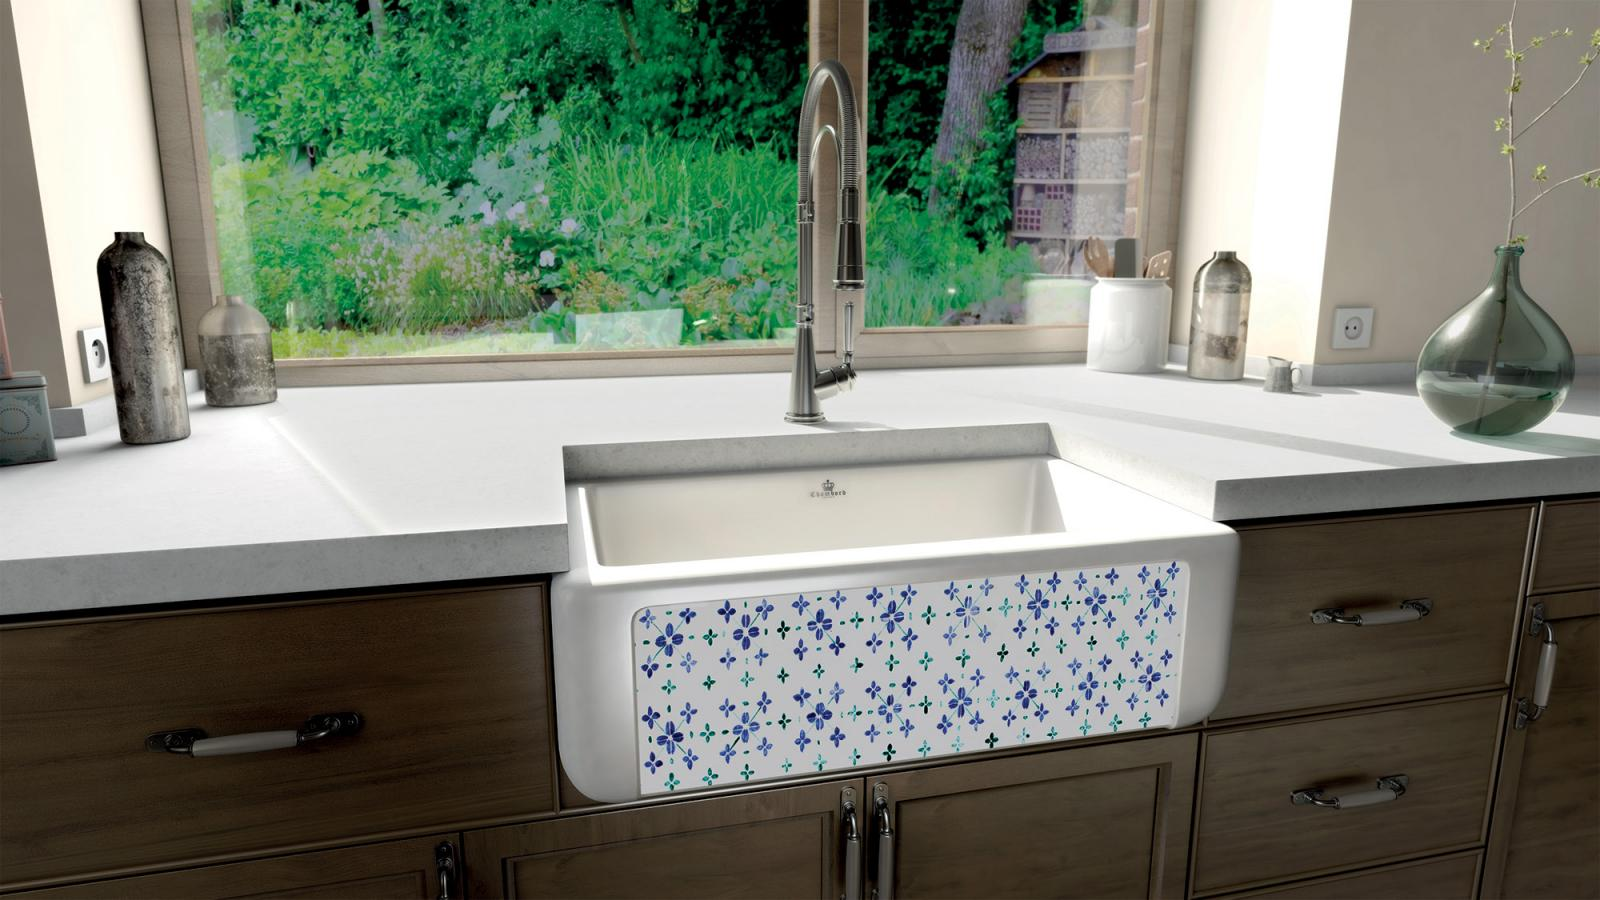 High-quality sink Henri II Le Grand Bretagne - single bowl, ceramic